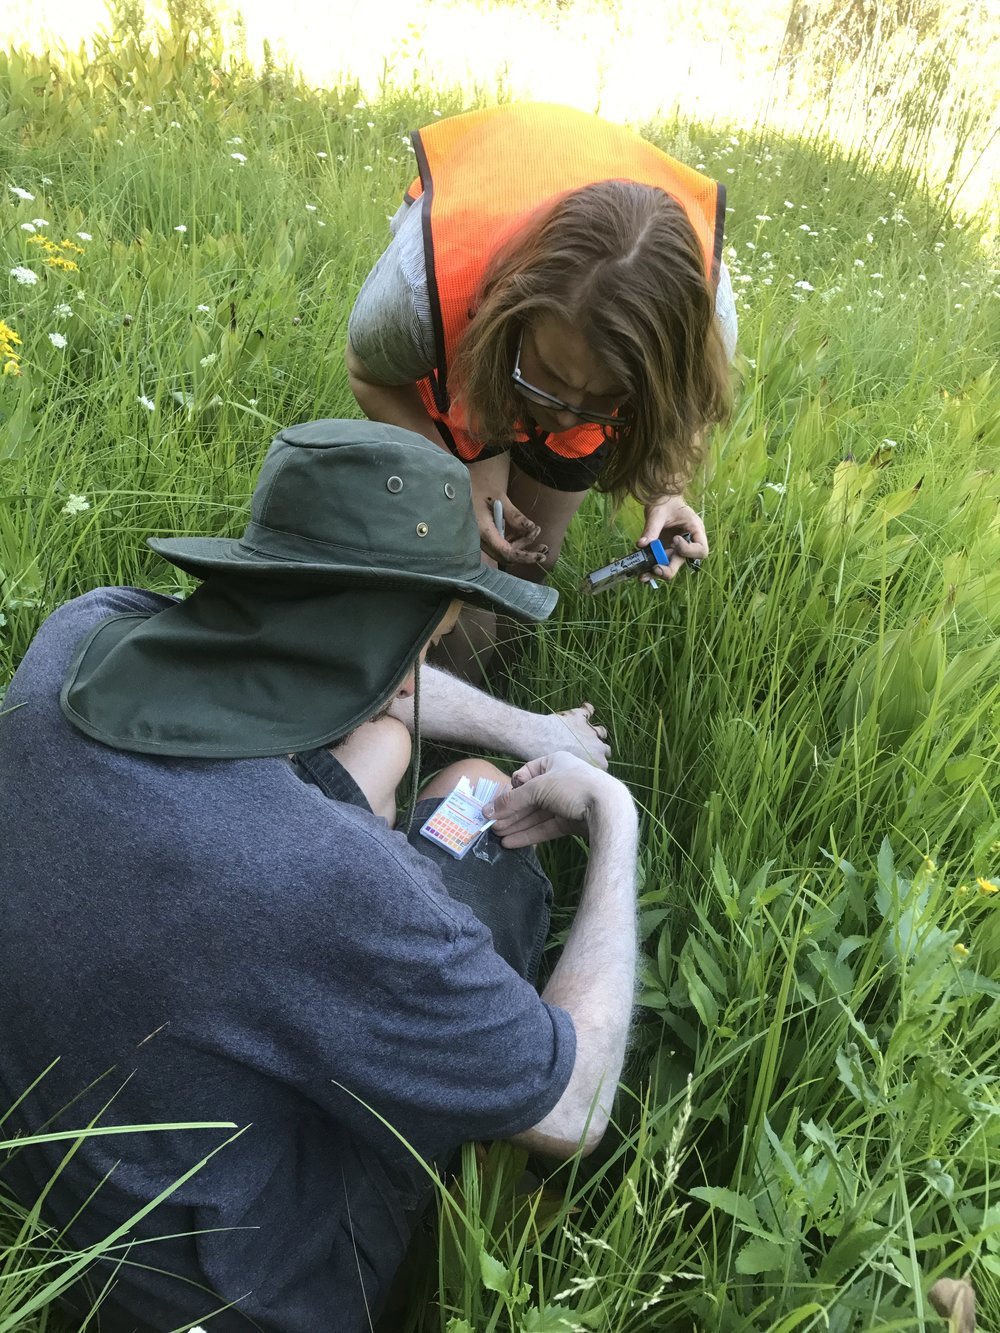 Dr. Nacho and Ellis Torrance testing the pH of soil samples from Drakesbad Marsh, Lassen Volcanic Natl. Park, Northern California.